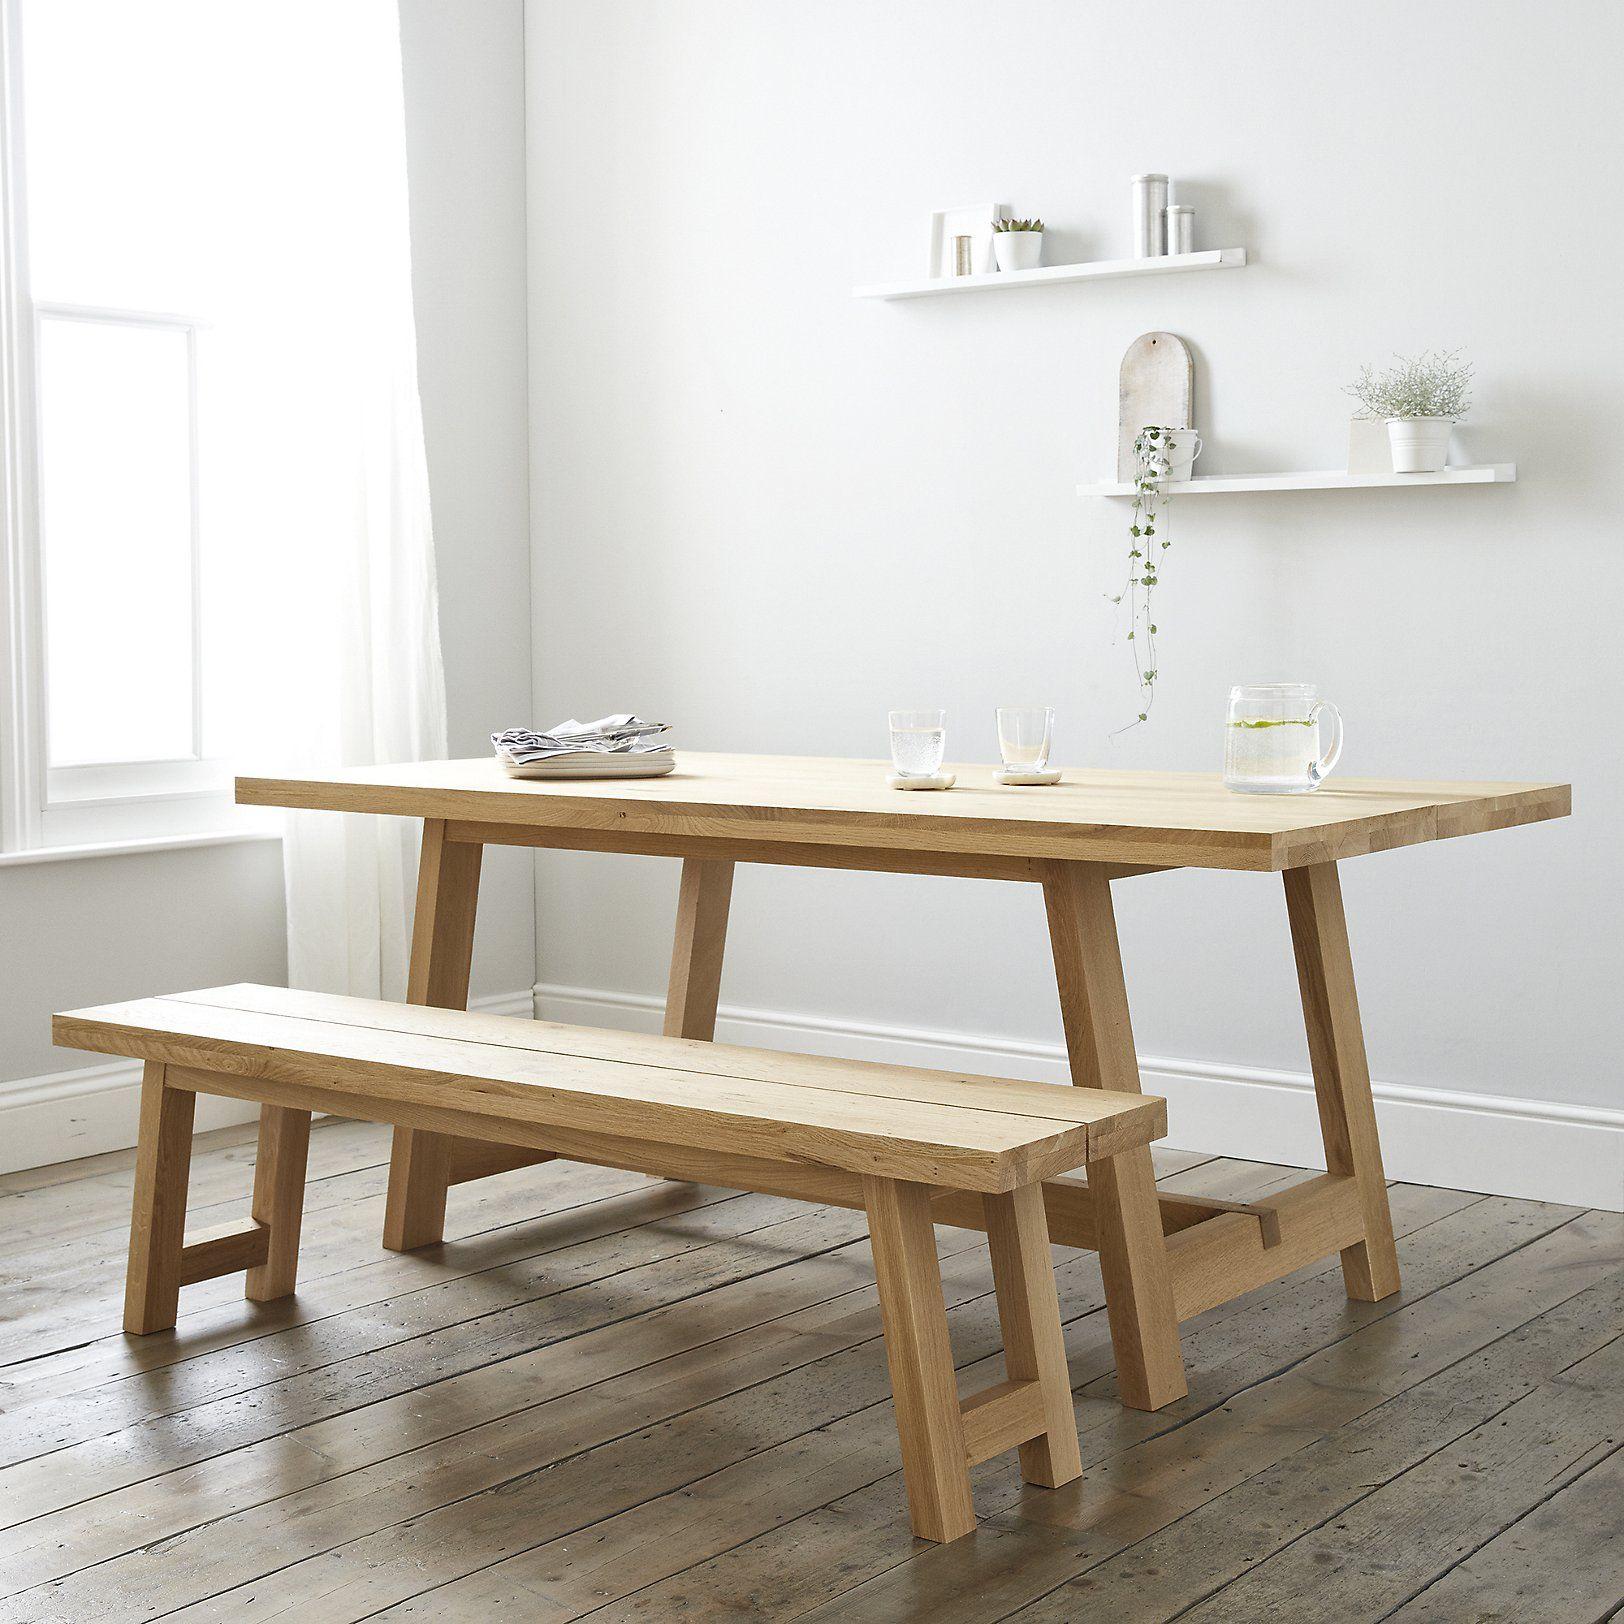 Oak dining table seater the white company uk mchawka